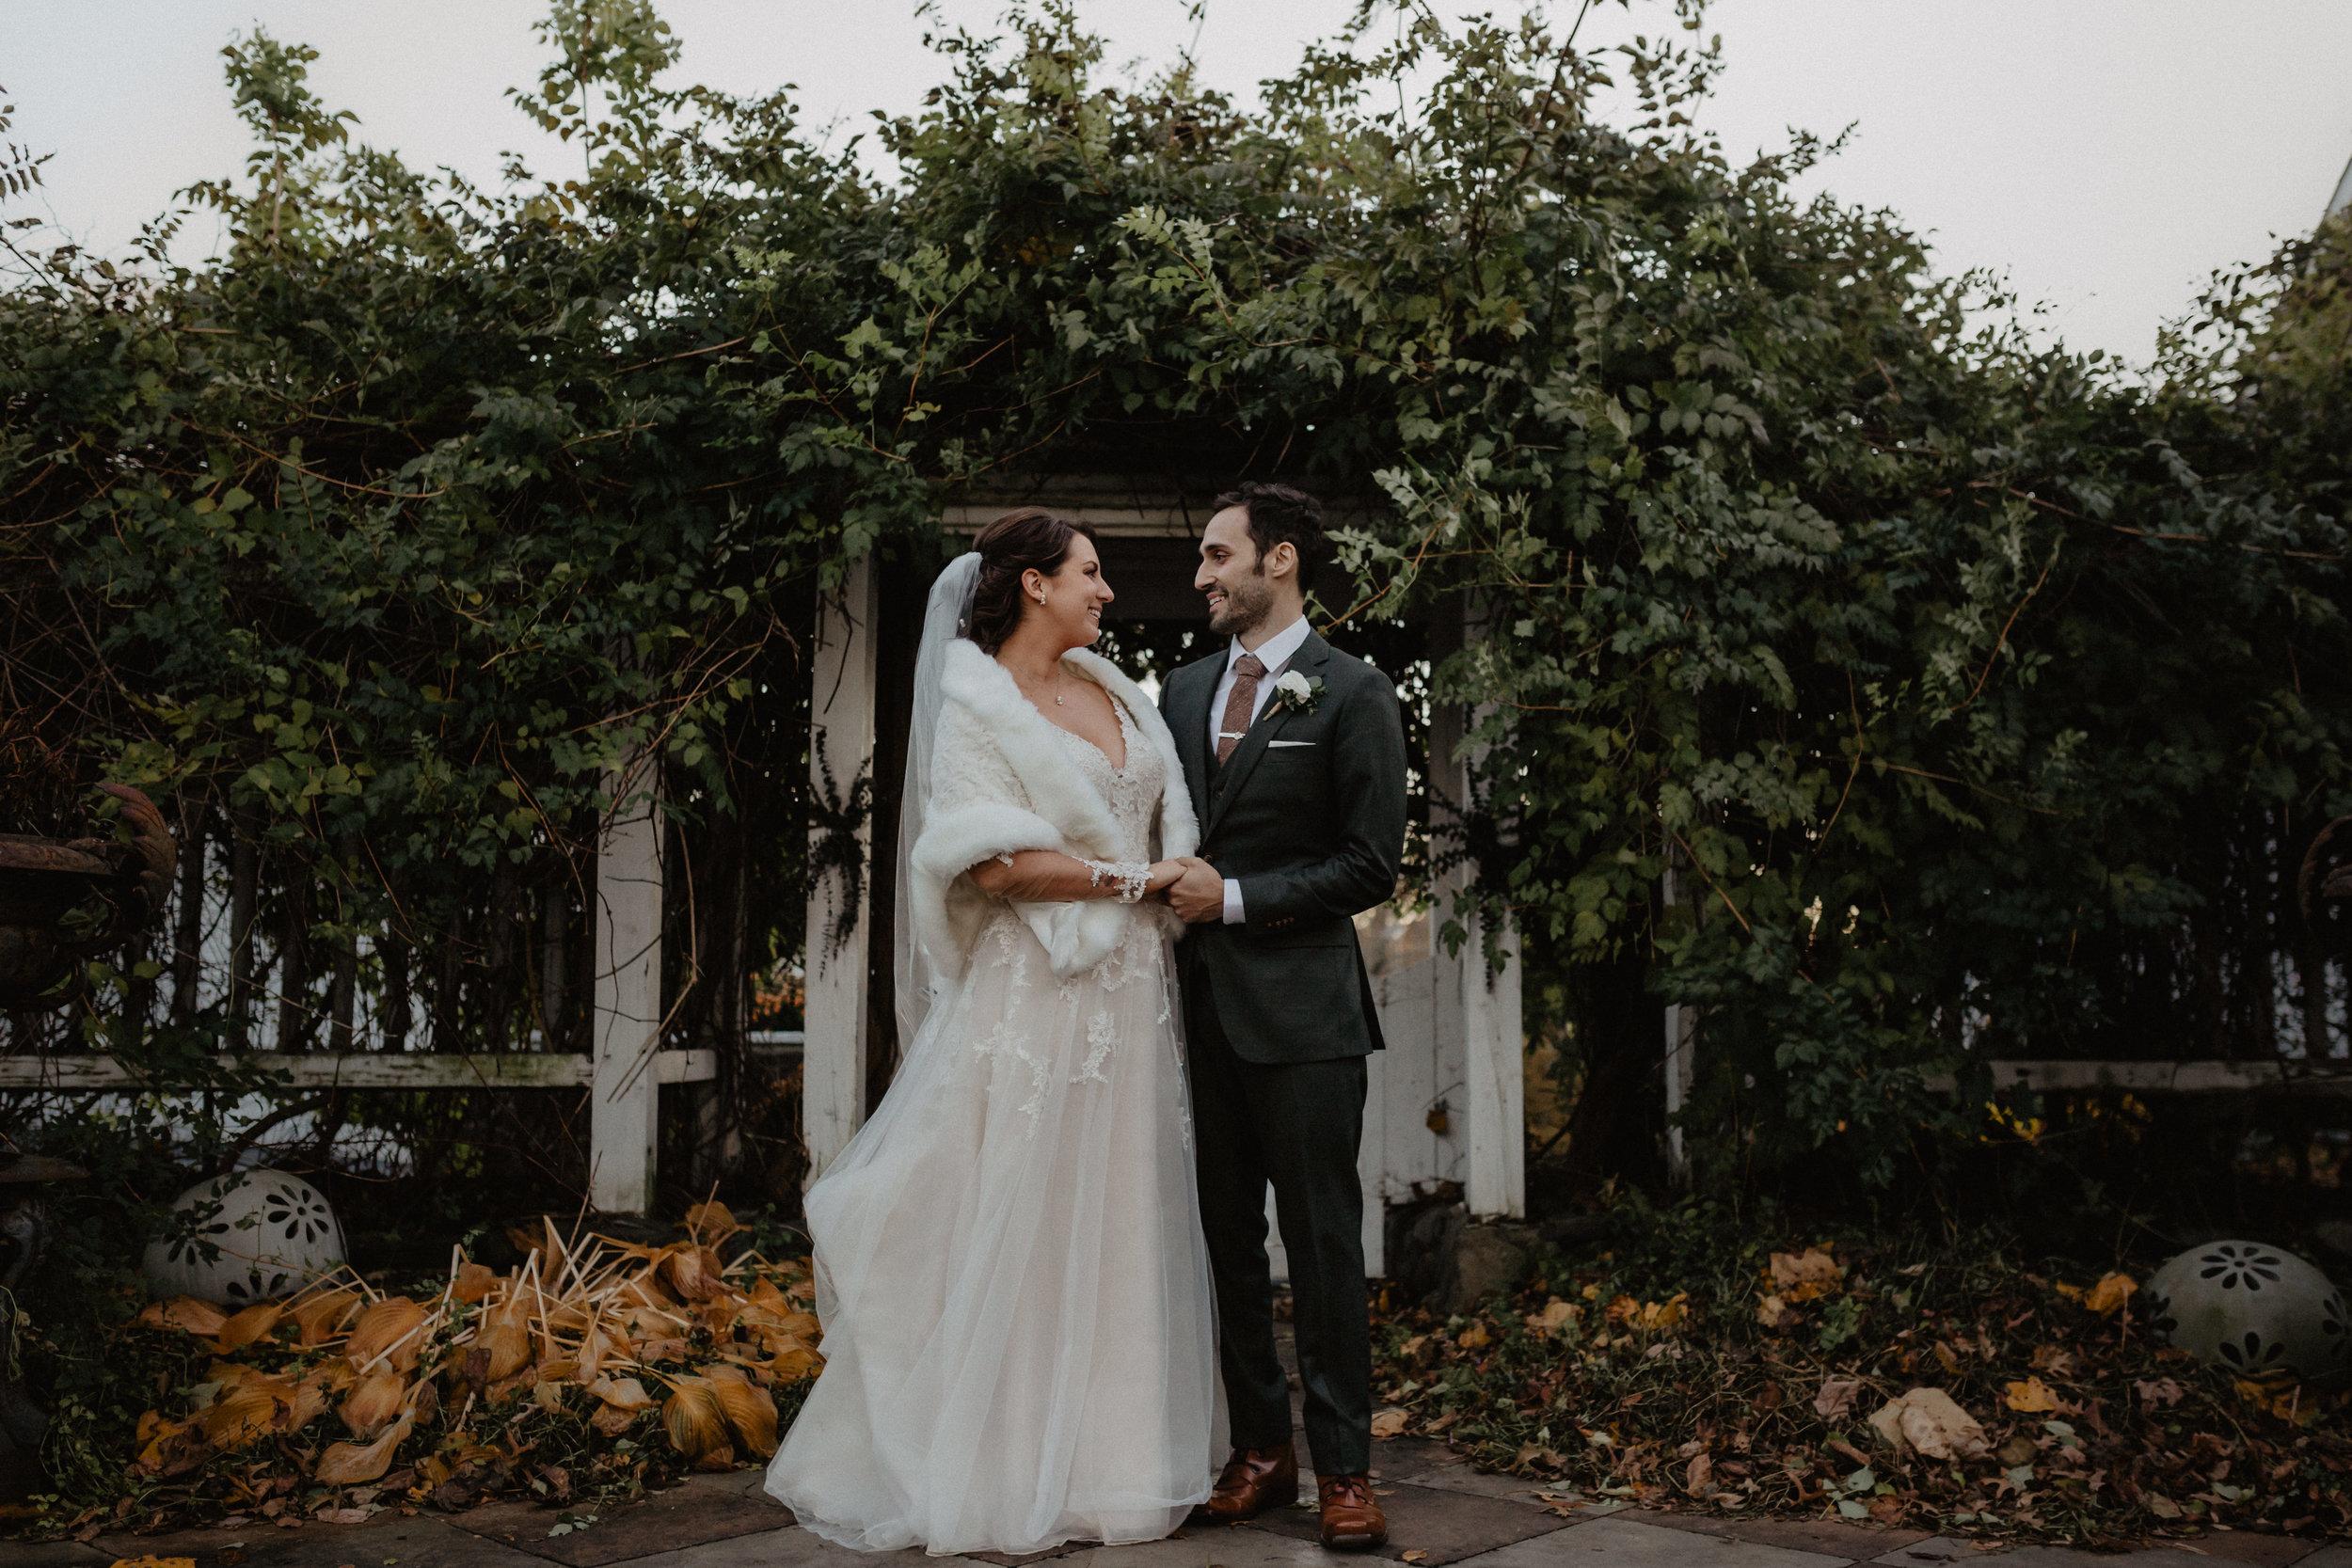 feast_at_round_hill_wedding_053.jpg